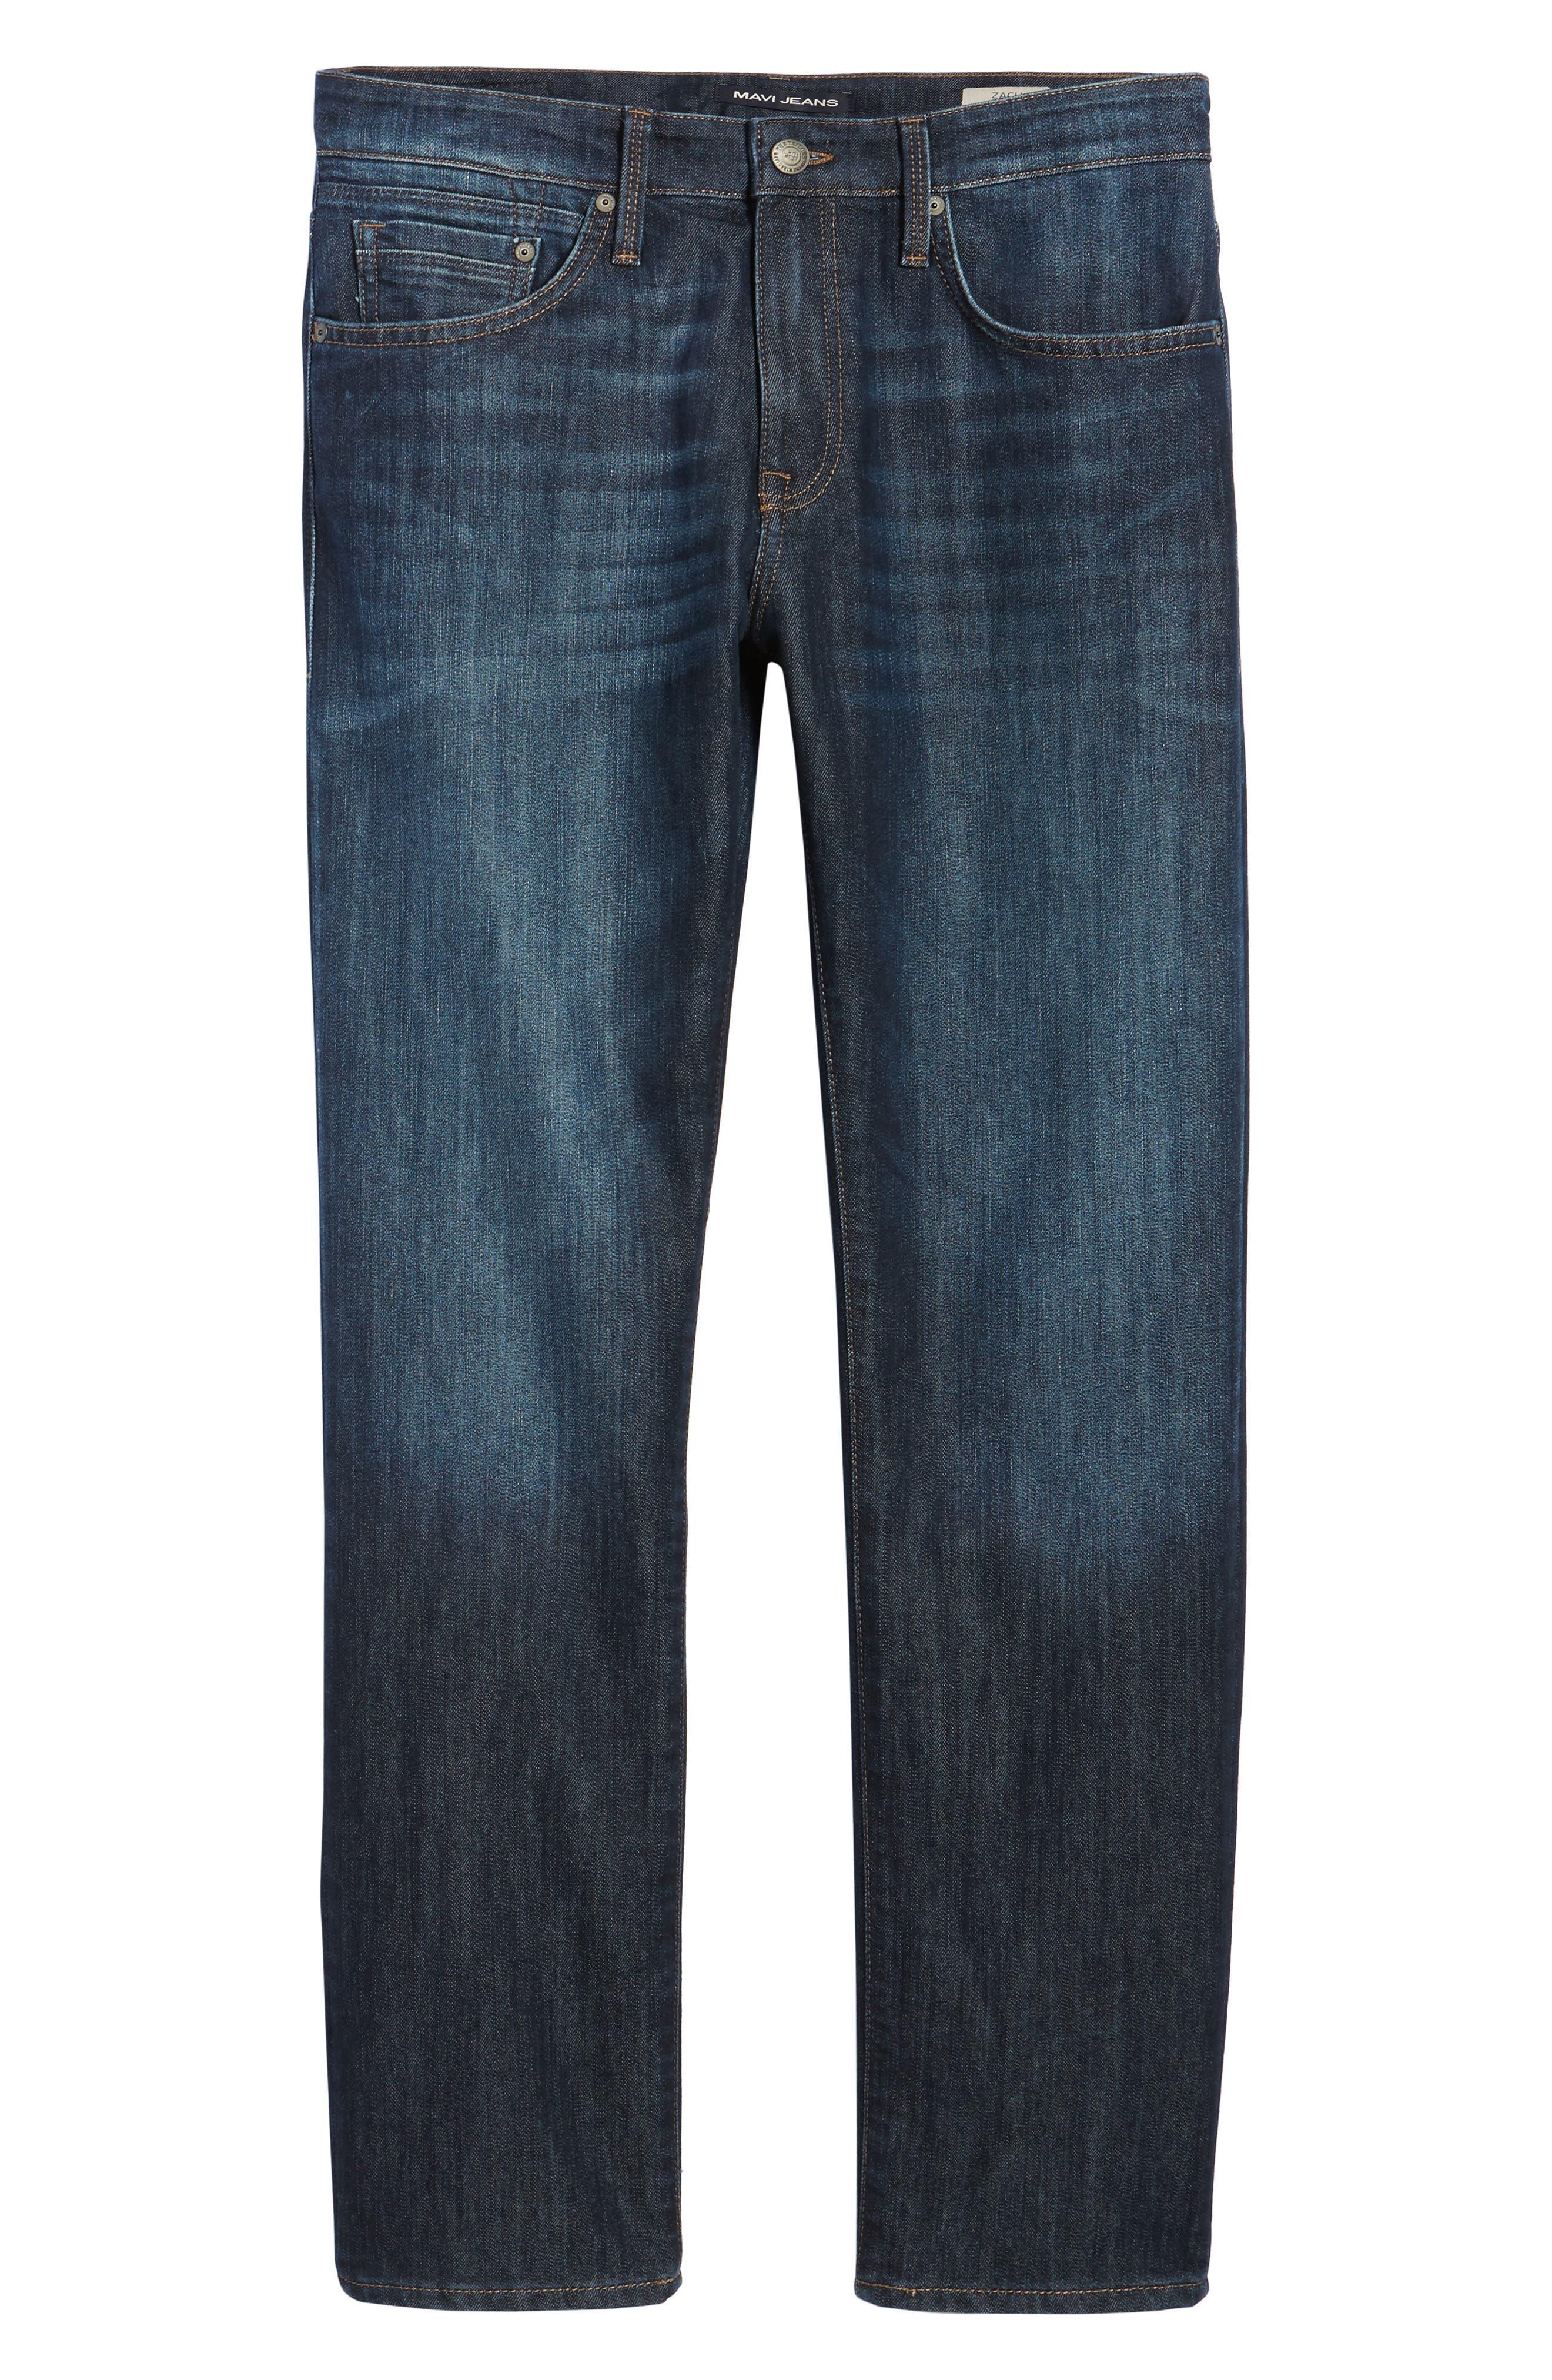 Zach Straight Leg Jeans,                             Alternate thumbnail 6, color,                             400